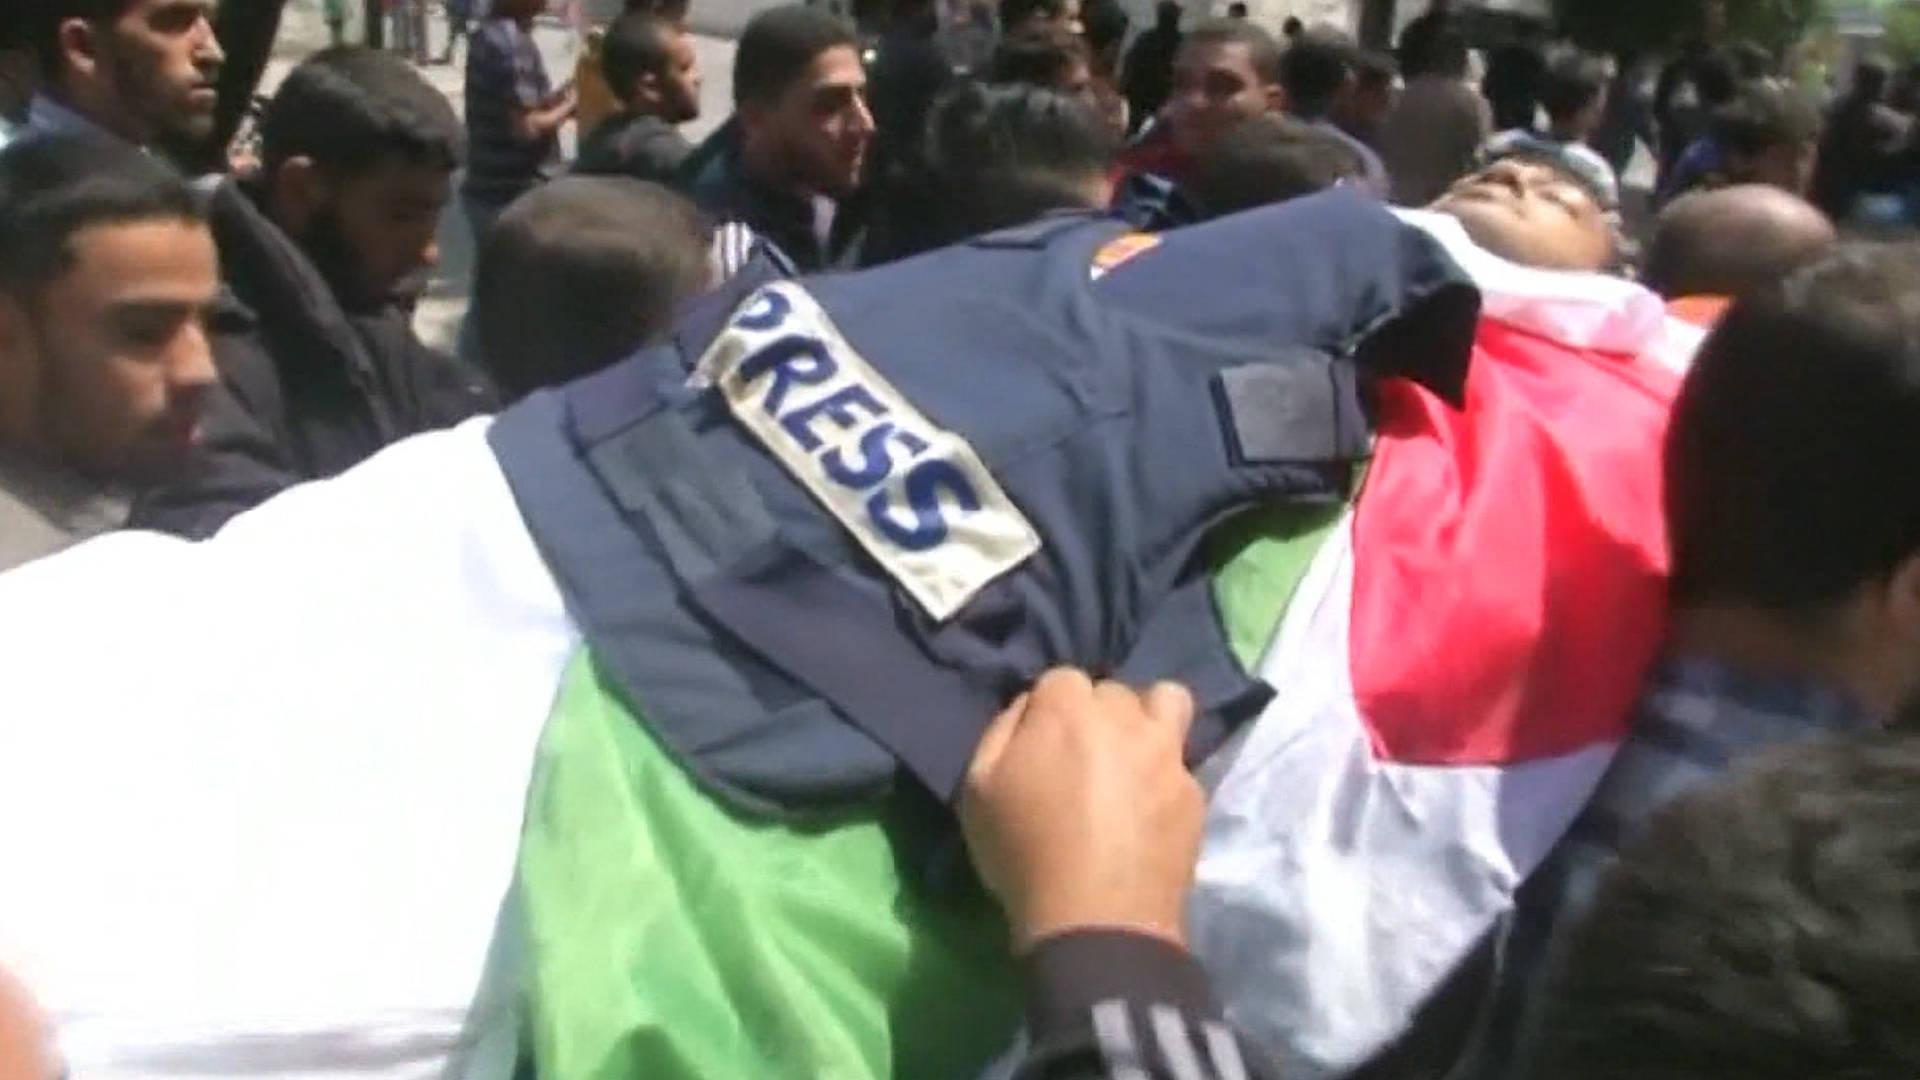 Rashid Khalidi: The Israeli Security Establishment is Terrified of a Nonviolent Palestinian Movement